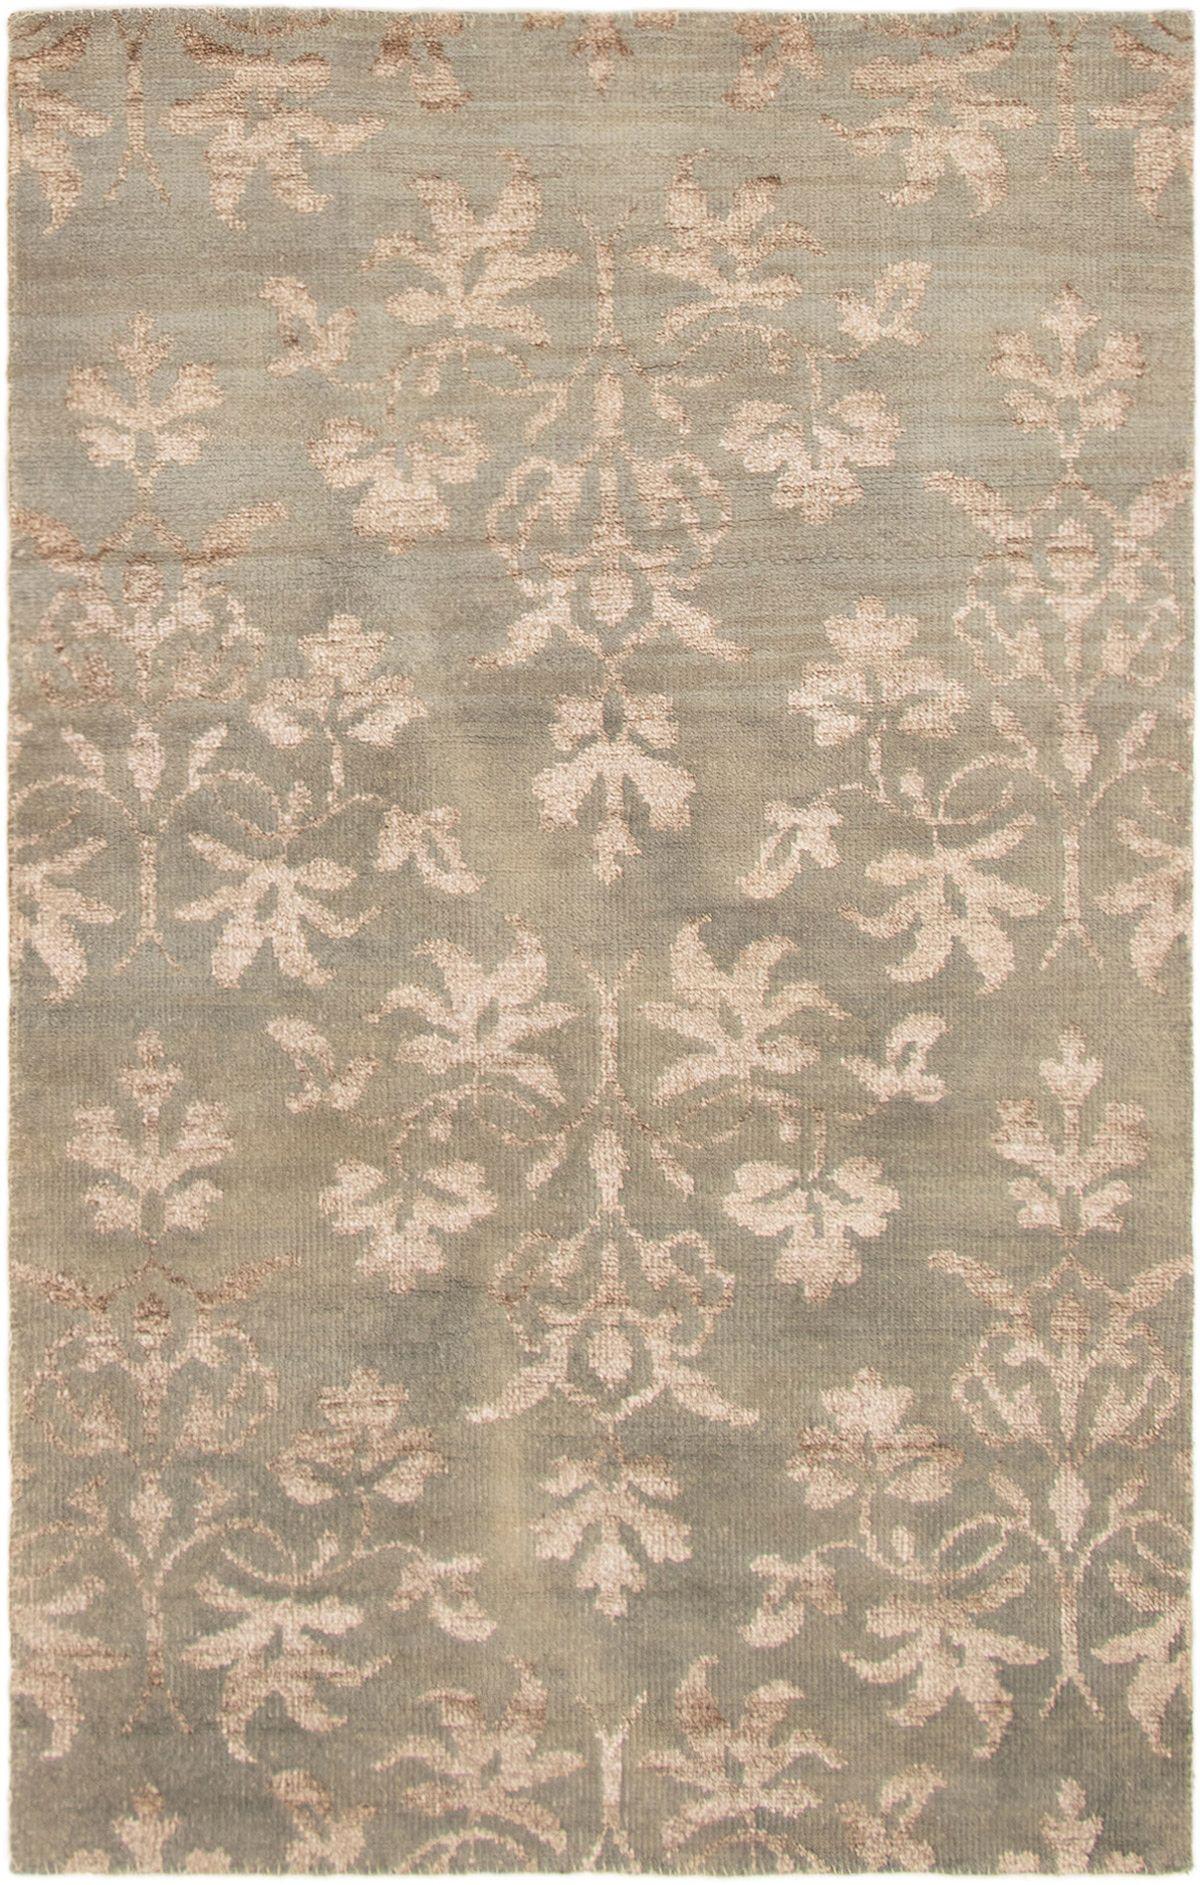 "Hand-knotted La Seda Light Green Wool/Silk Rug 4'11"" x 7'11"" Size: 4'11"" x 7'11"""